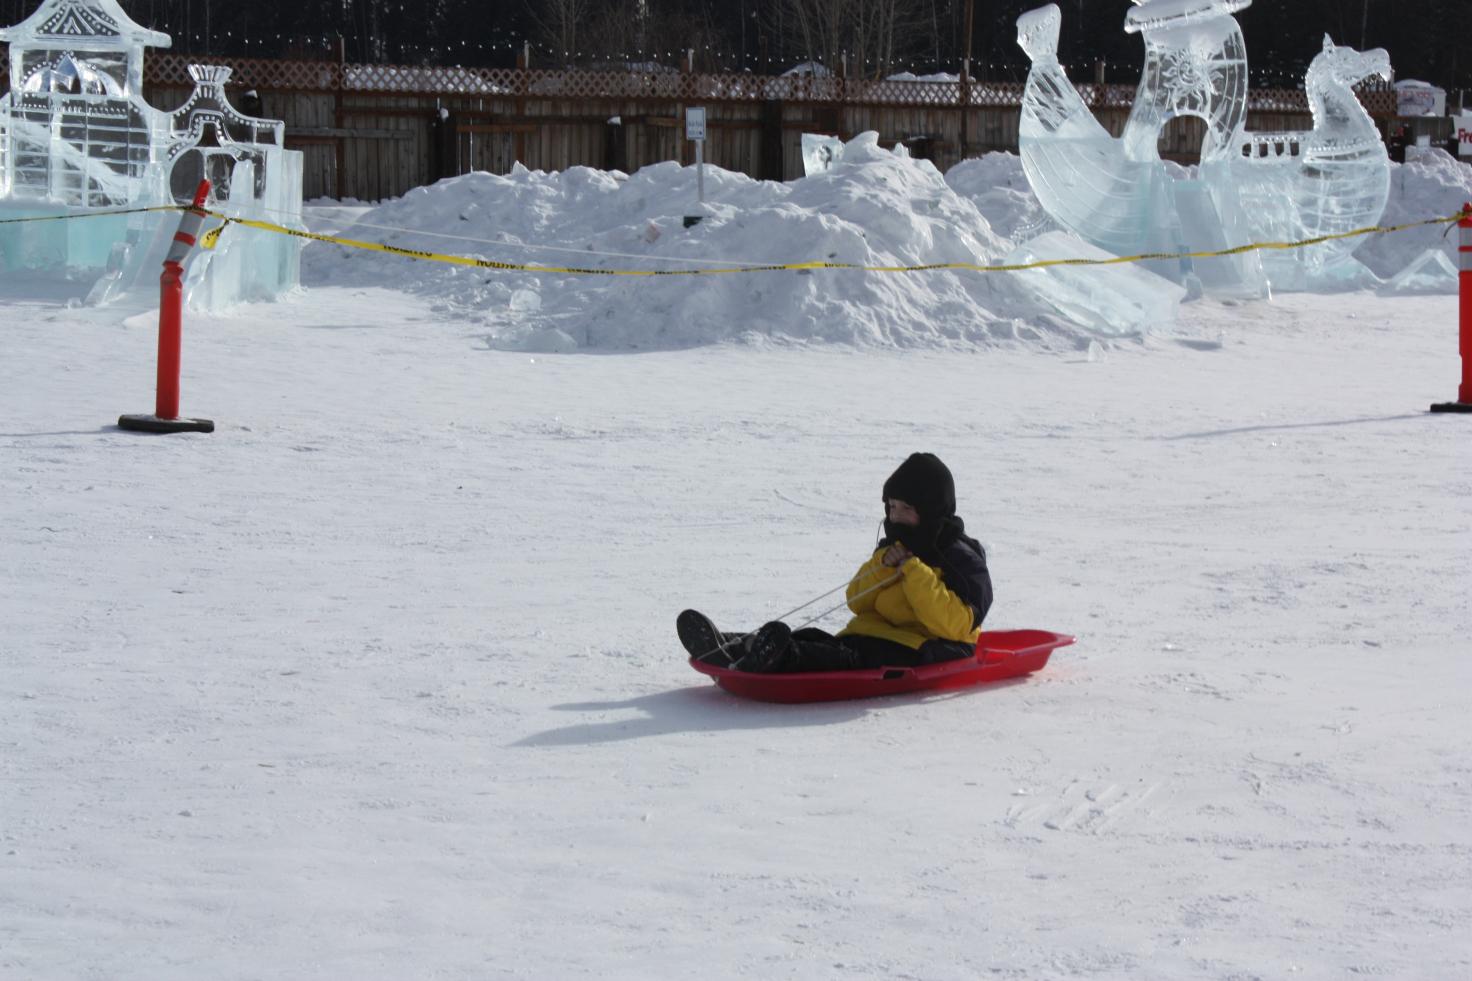 Sledding at the Ice Festival